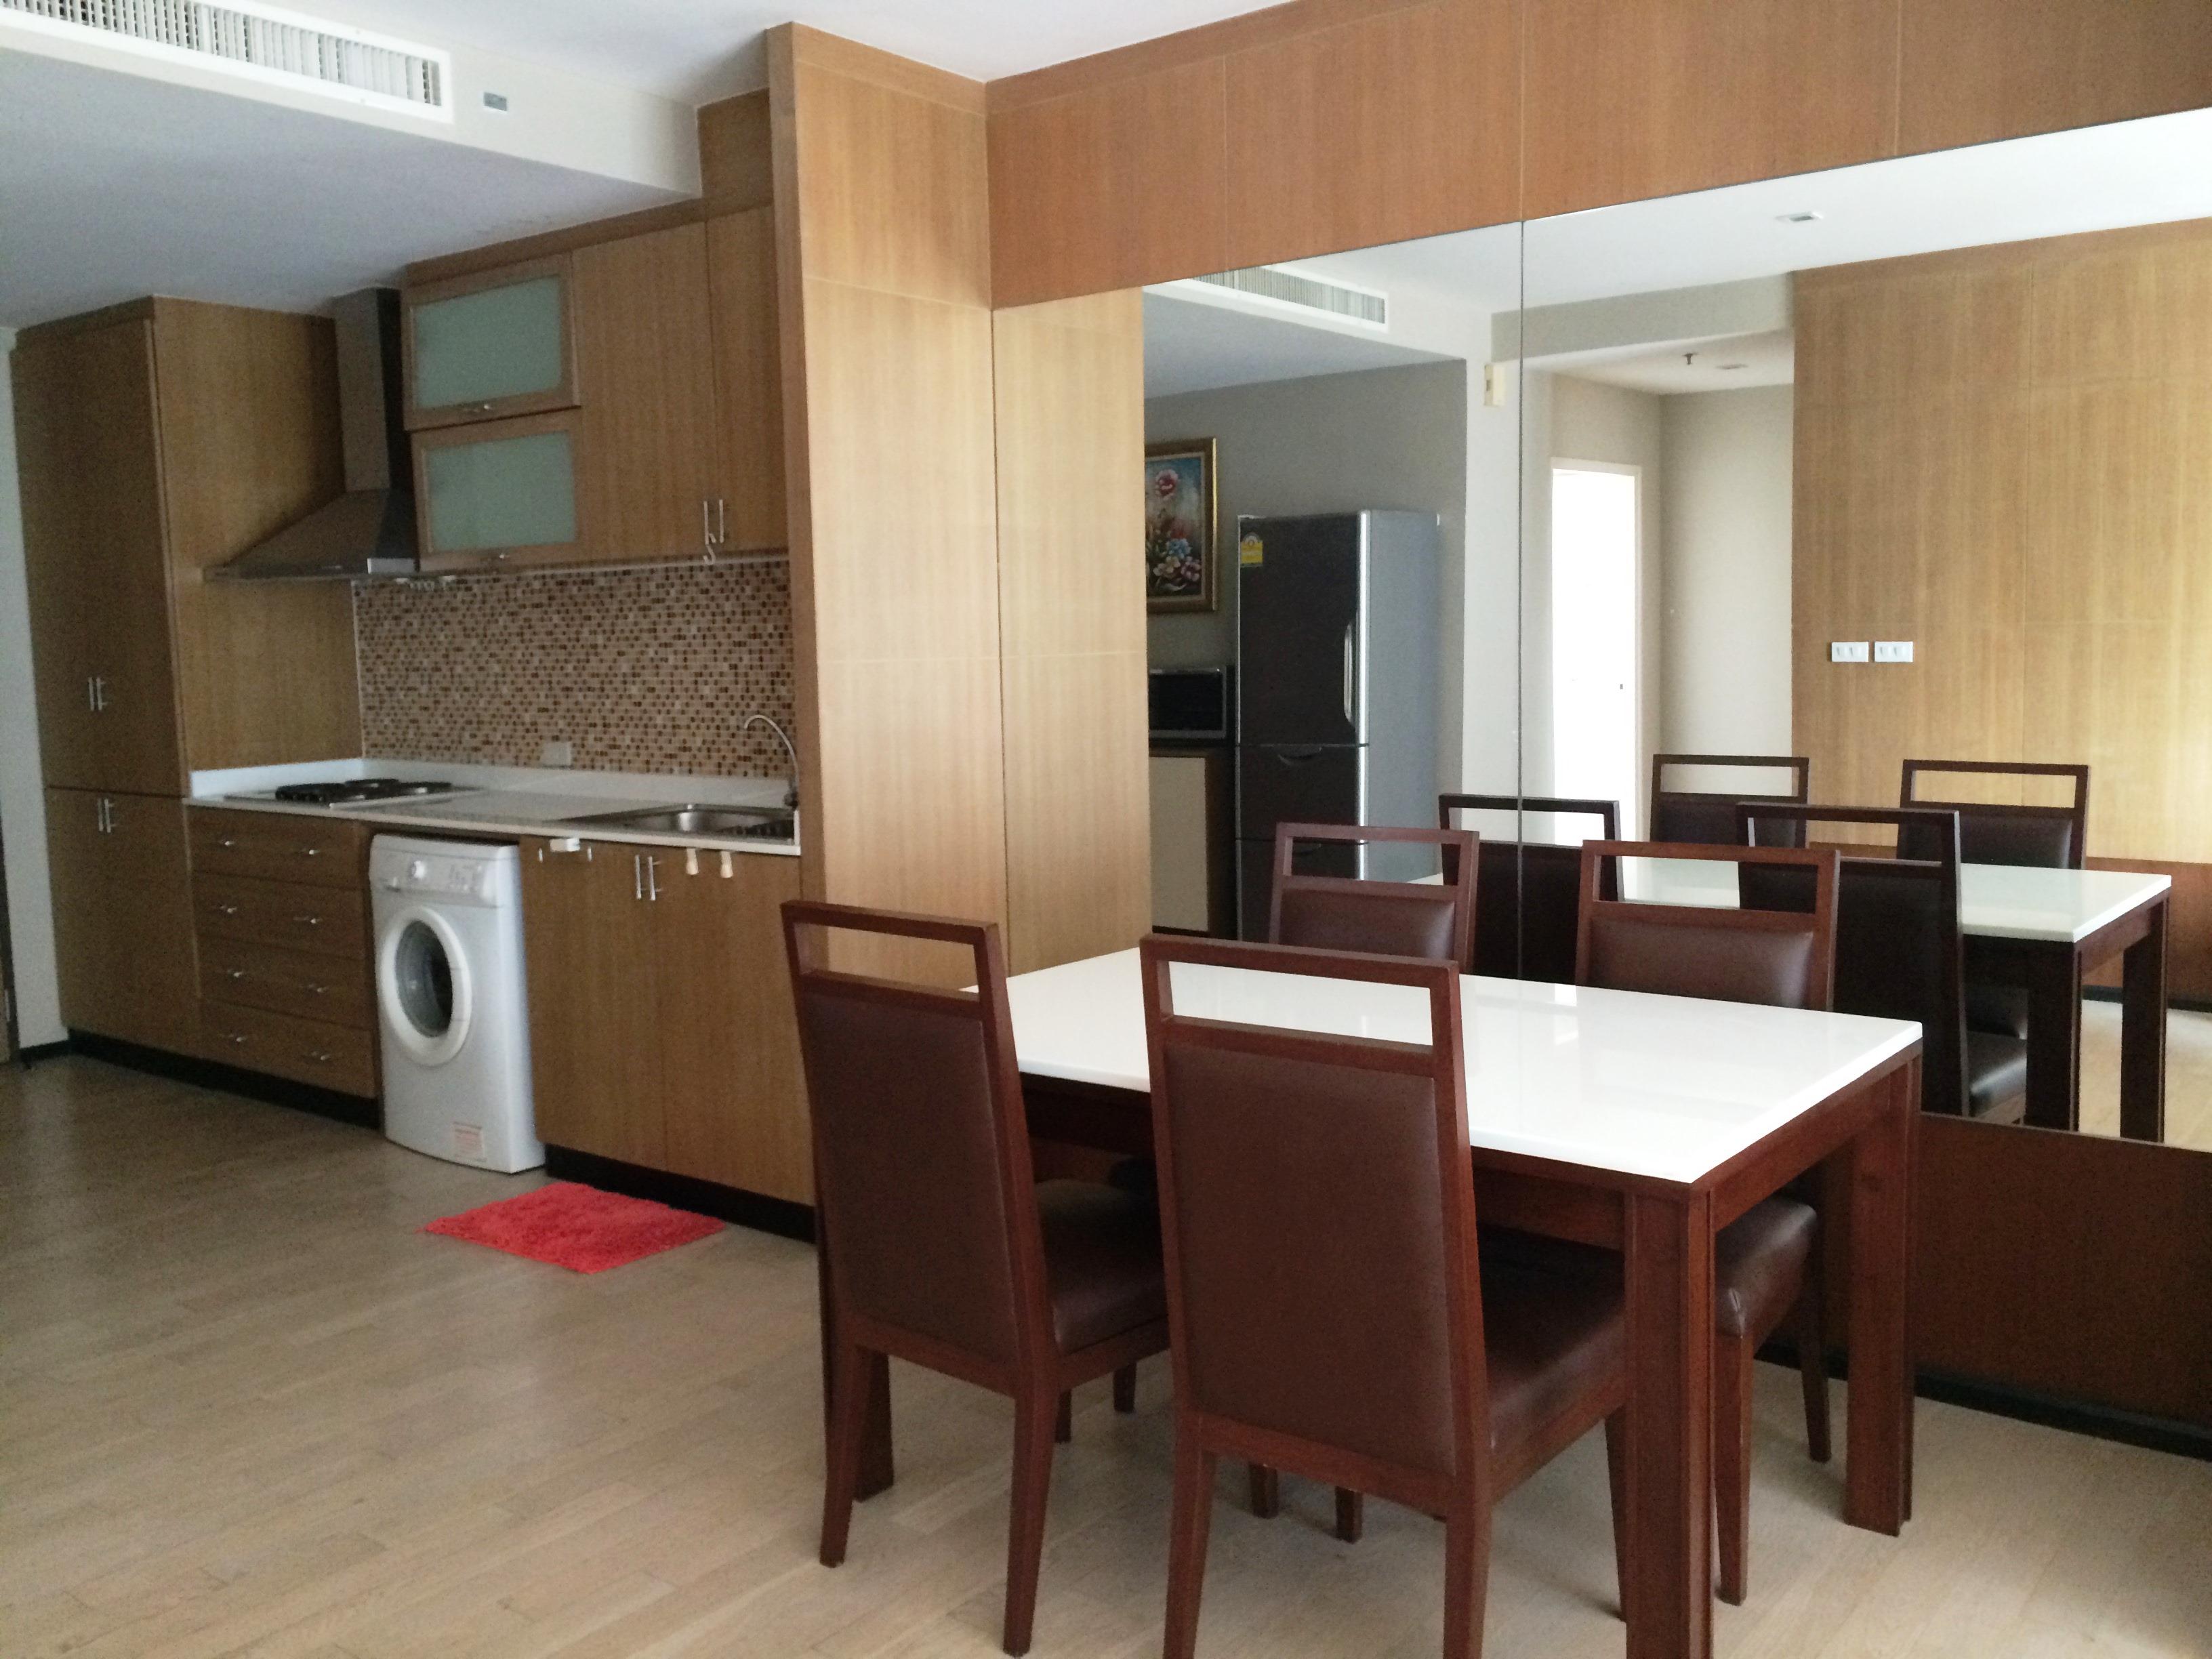 RE/MAX Properties Agency's Noble Remix, 2B/2B, High floor, BTS Thong Lo - sky walk access 6